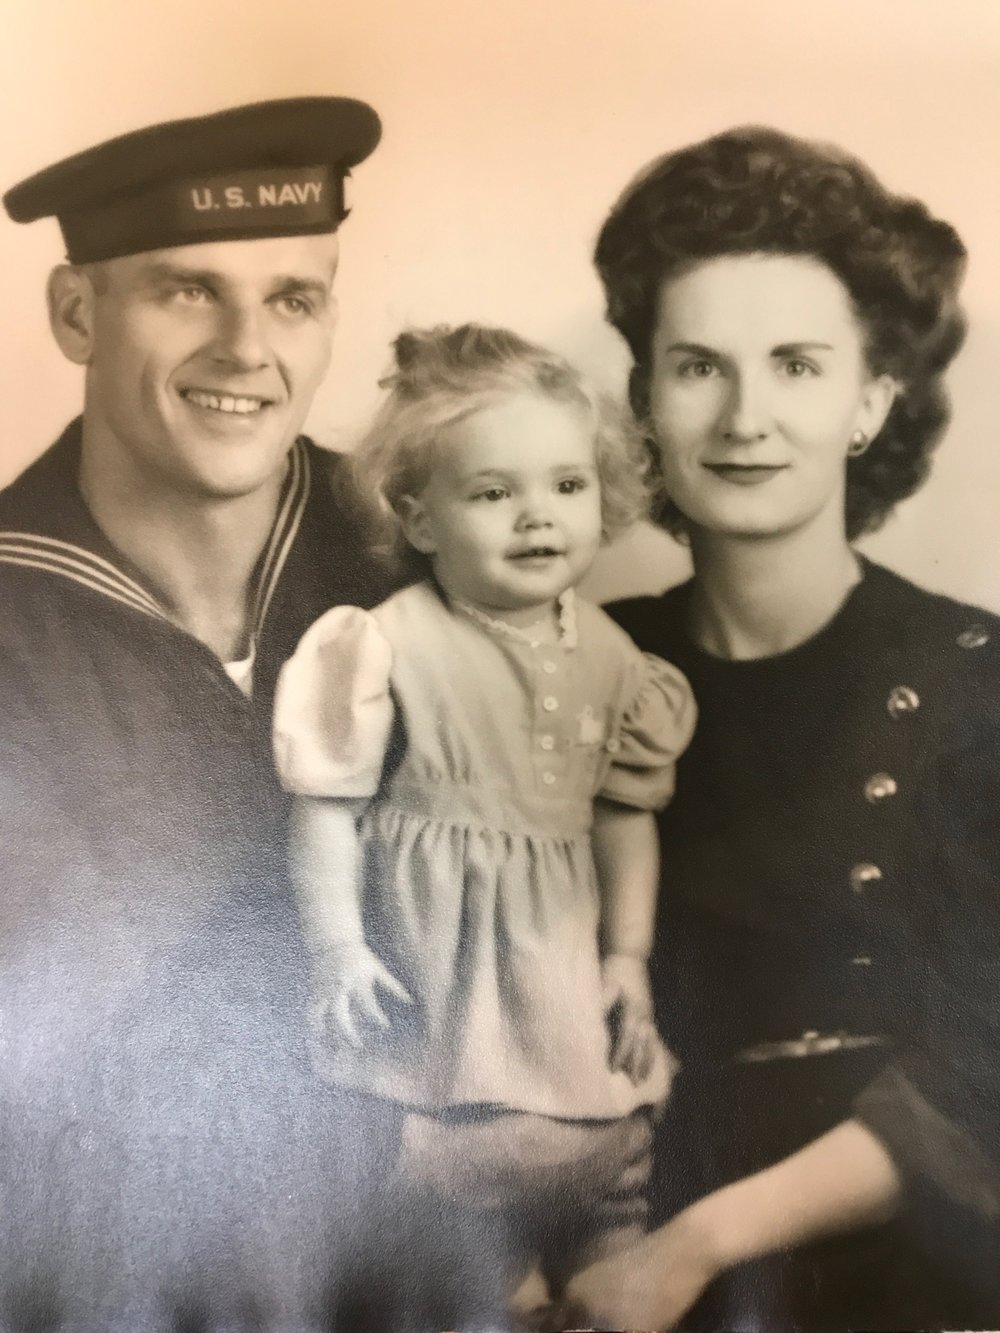 Grandma & Grandpa in the 1940s